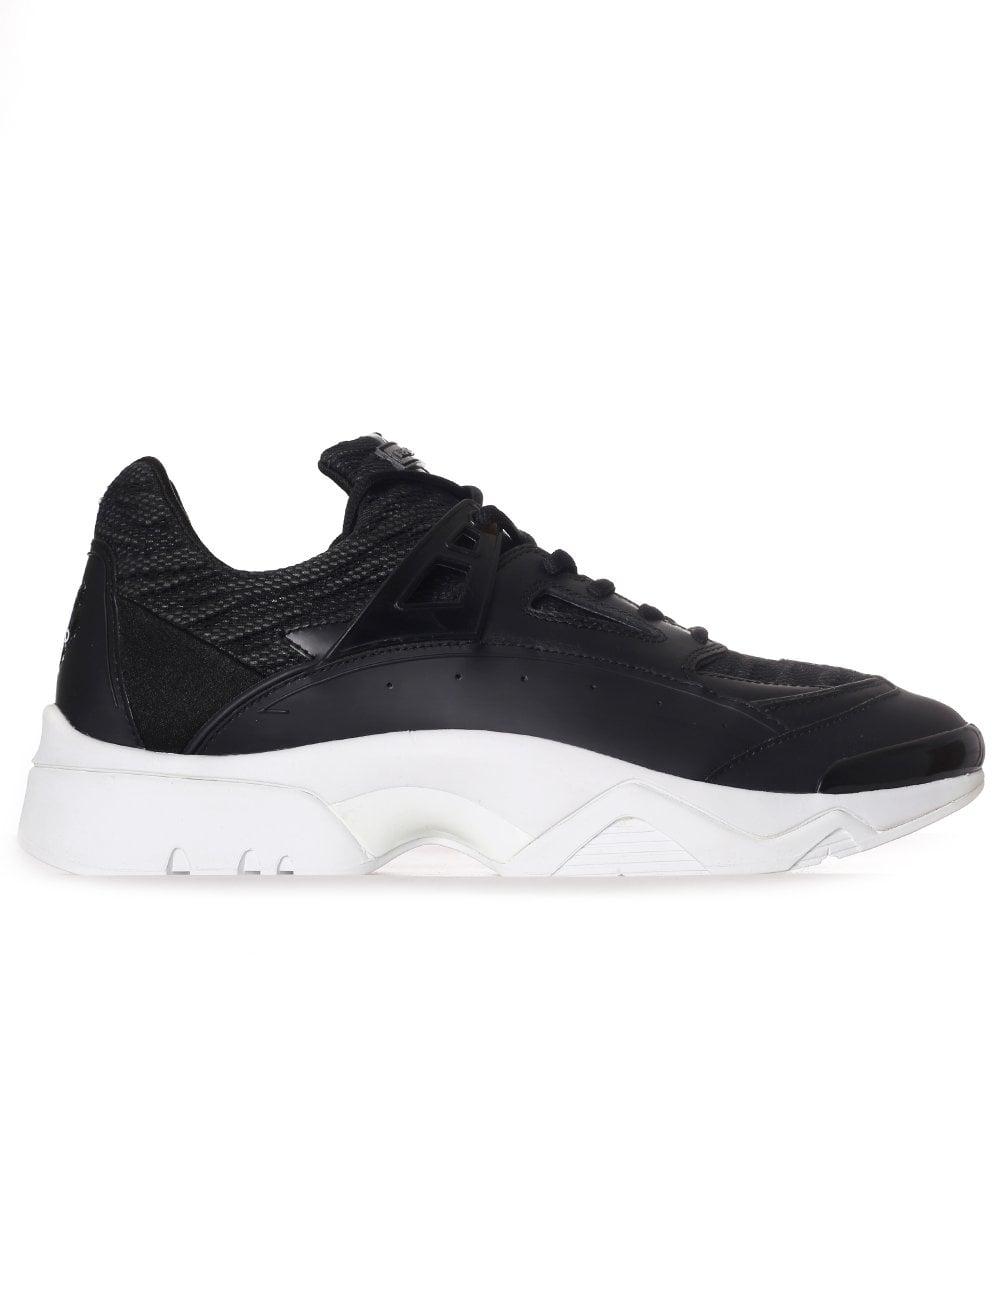 96748fd376b Kenzo Men s Sonic Sneakers